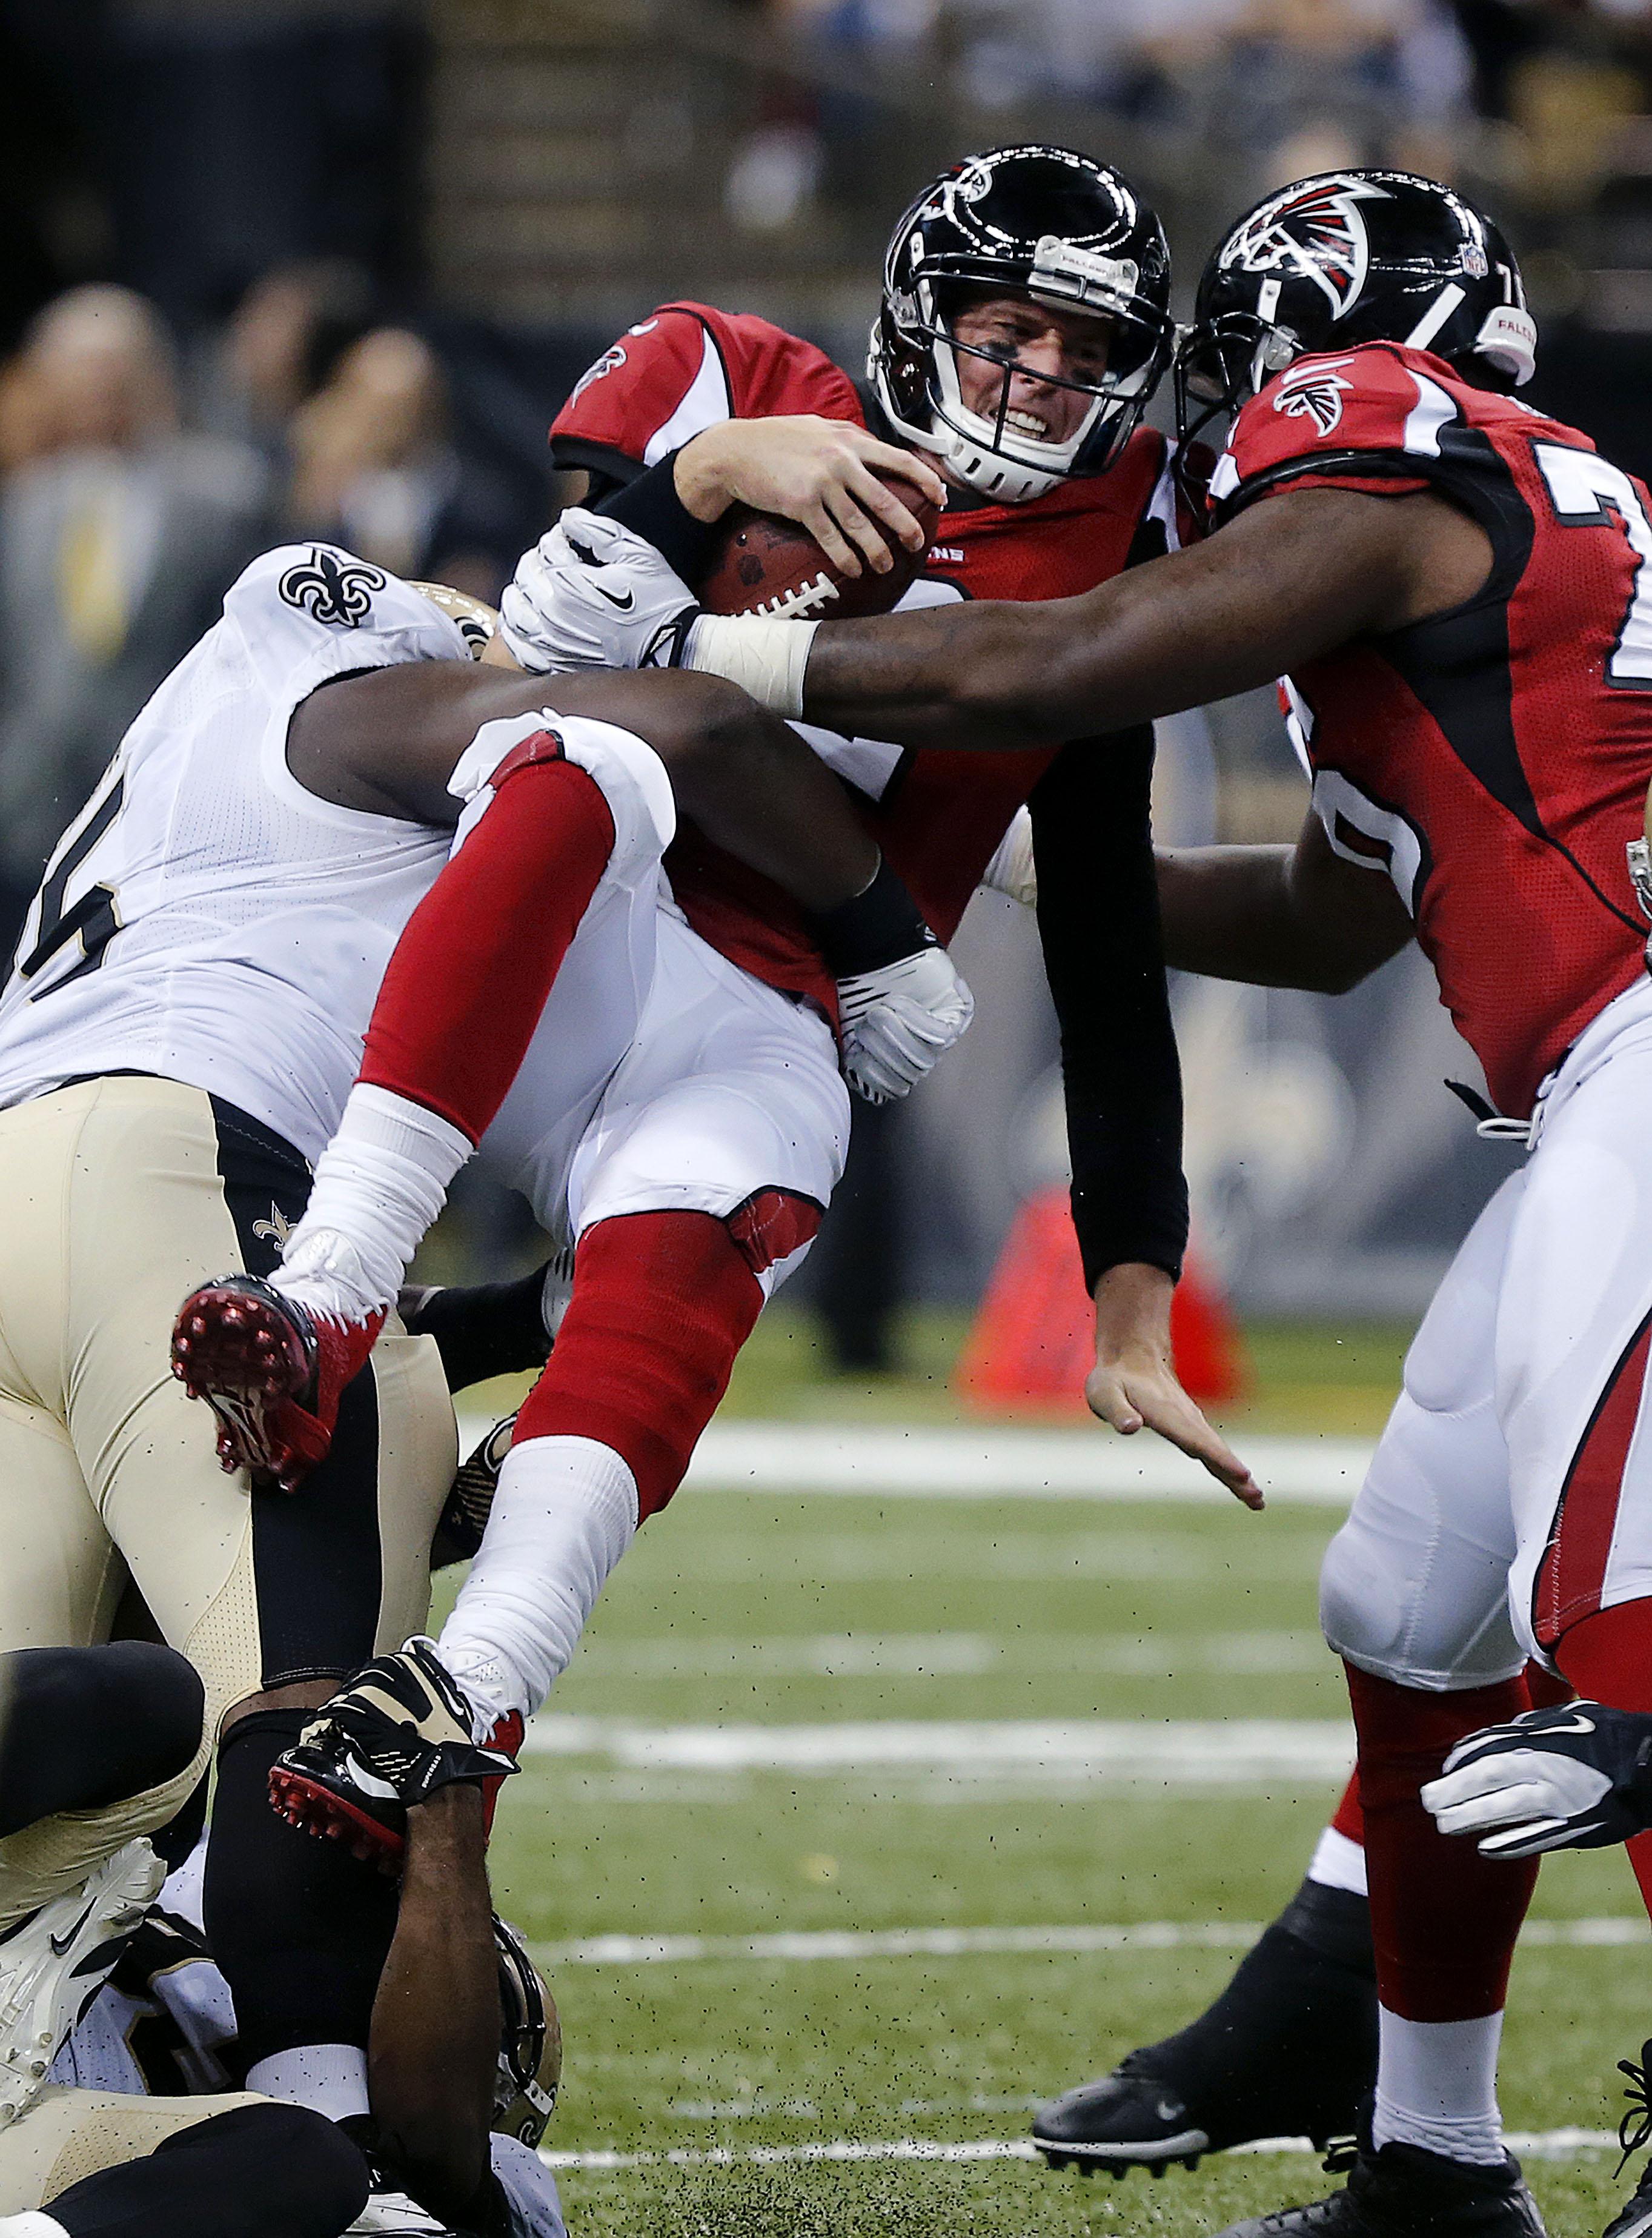 Defense helps Saints beat Falcons 23-17